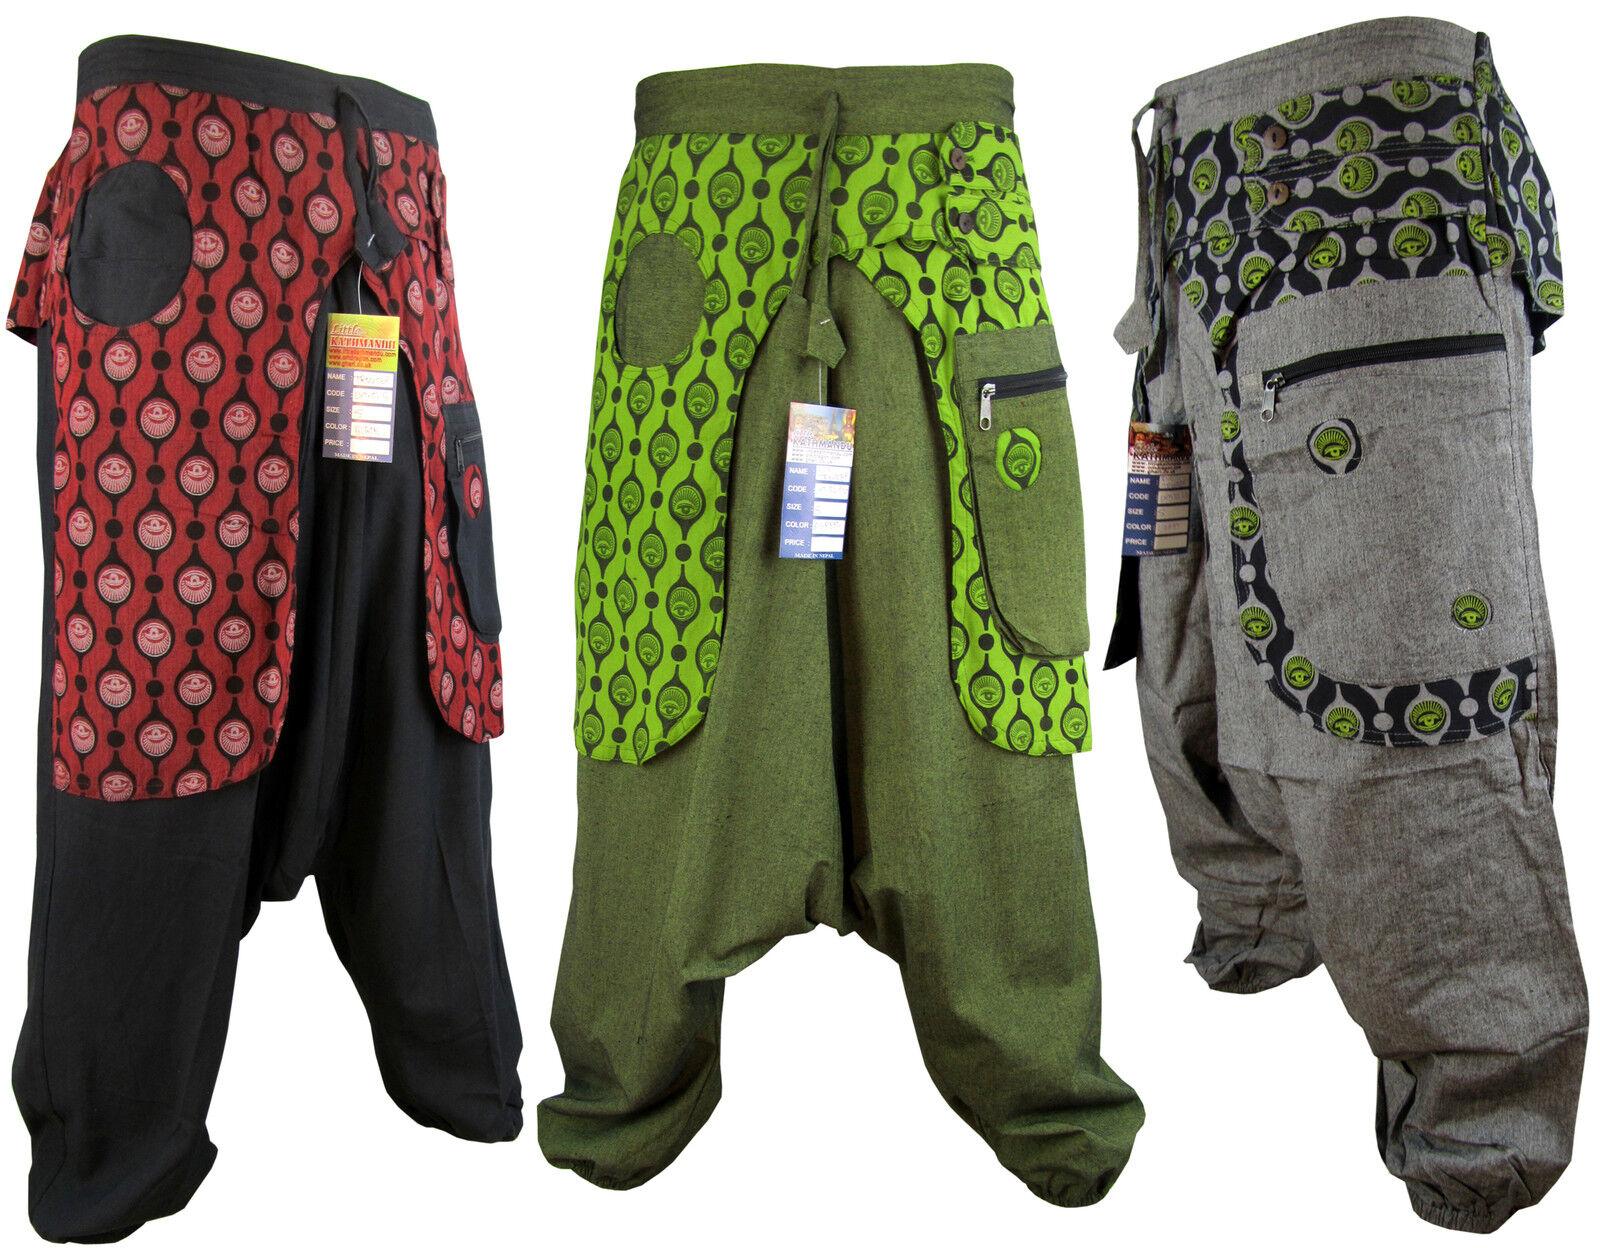 Hippie Boho harem aladdin trouser baggie ali baba pants retro vintage hippy